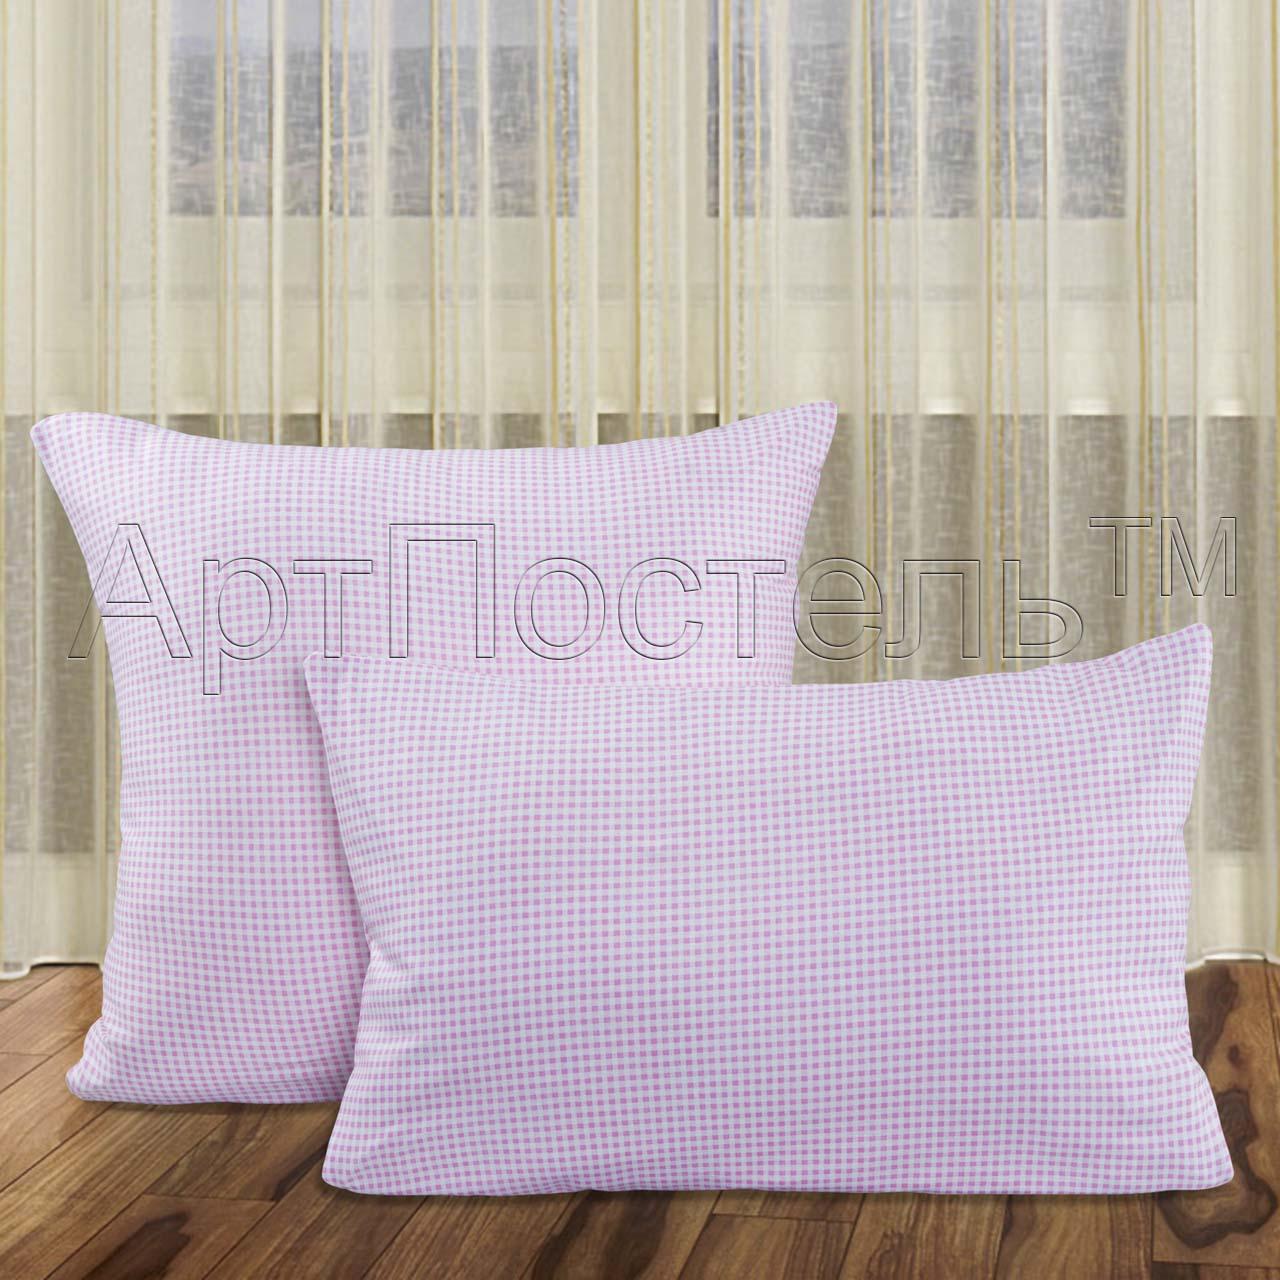 Наволочки Клетка Розовый, размер 50х70 смНаволочки<br>Плотность ткани: 140 г/кв. м <br>Количество: 2 шт.<br><br>Тип: Наволочки<br>Размер: 50х70<br>Материал: Кулирка